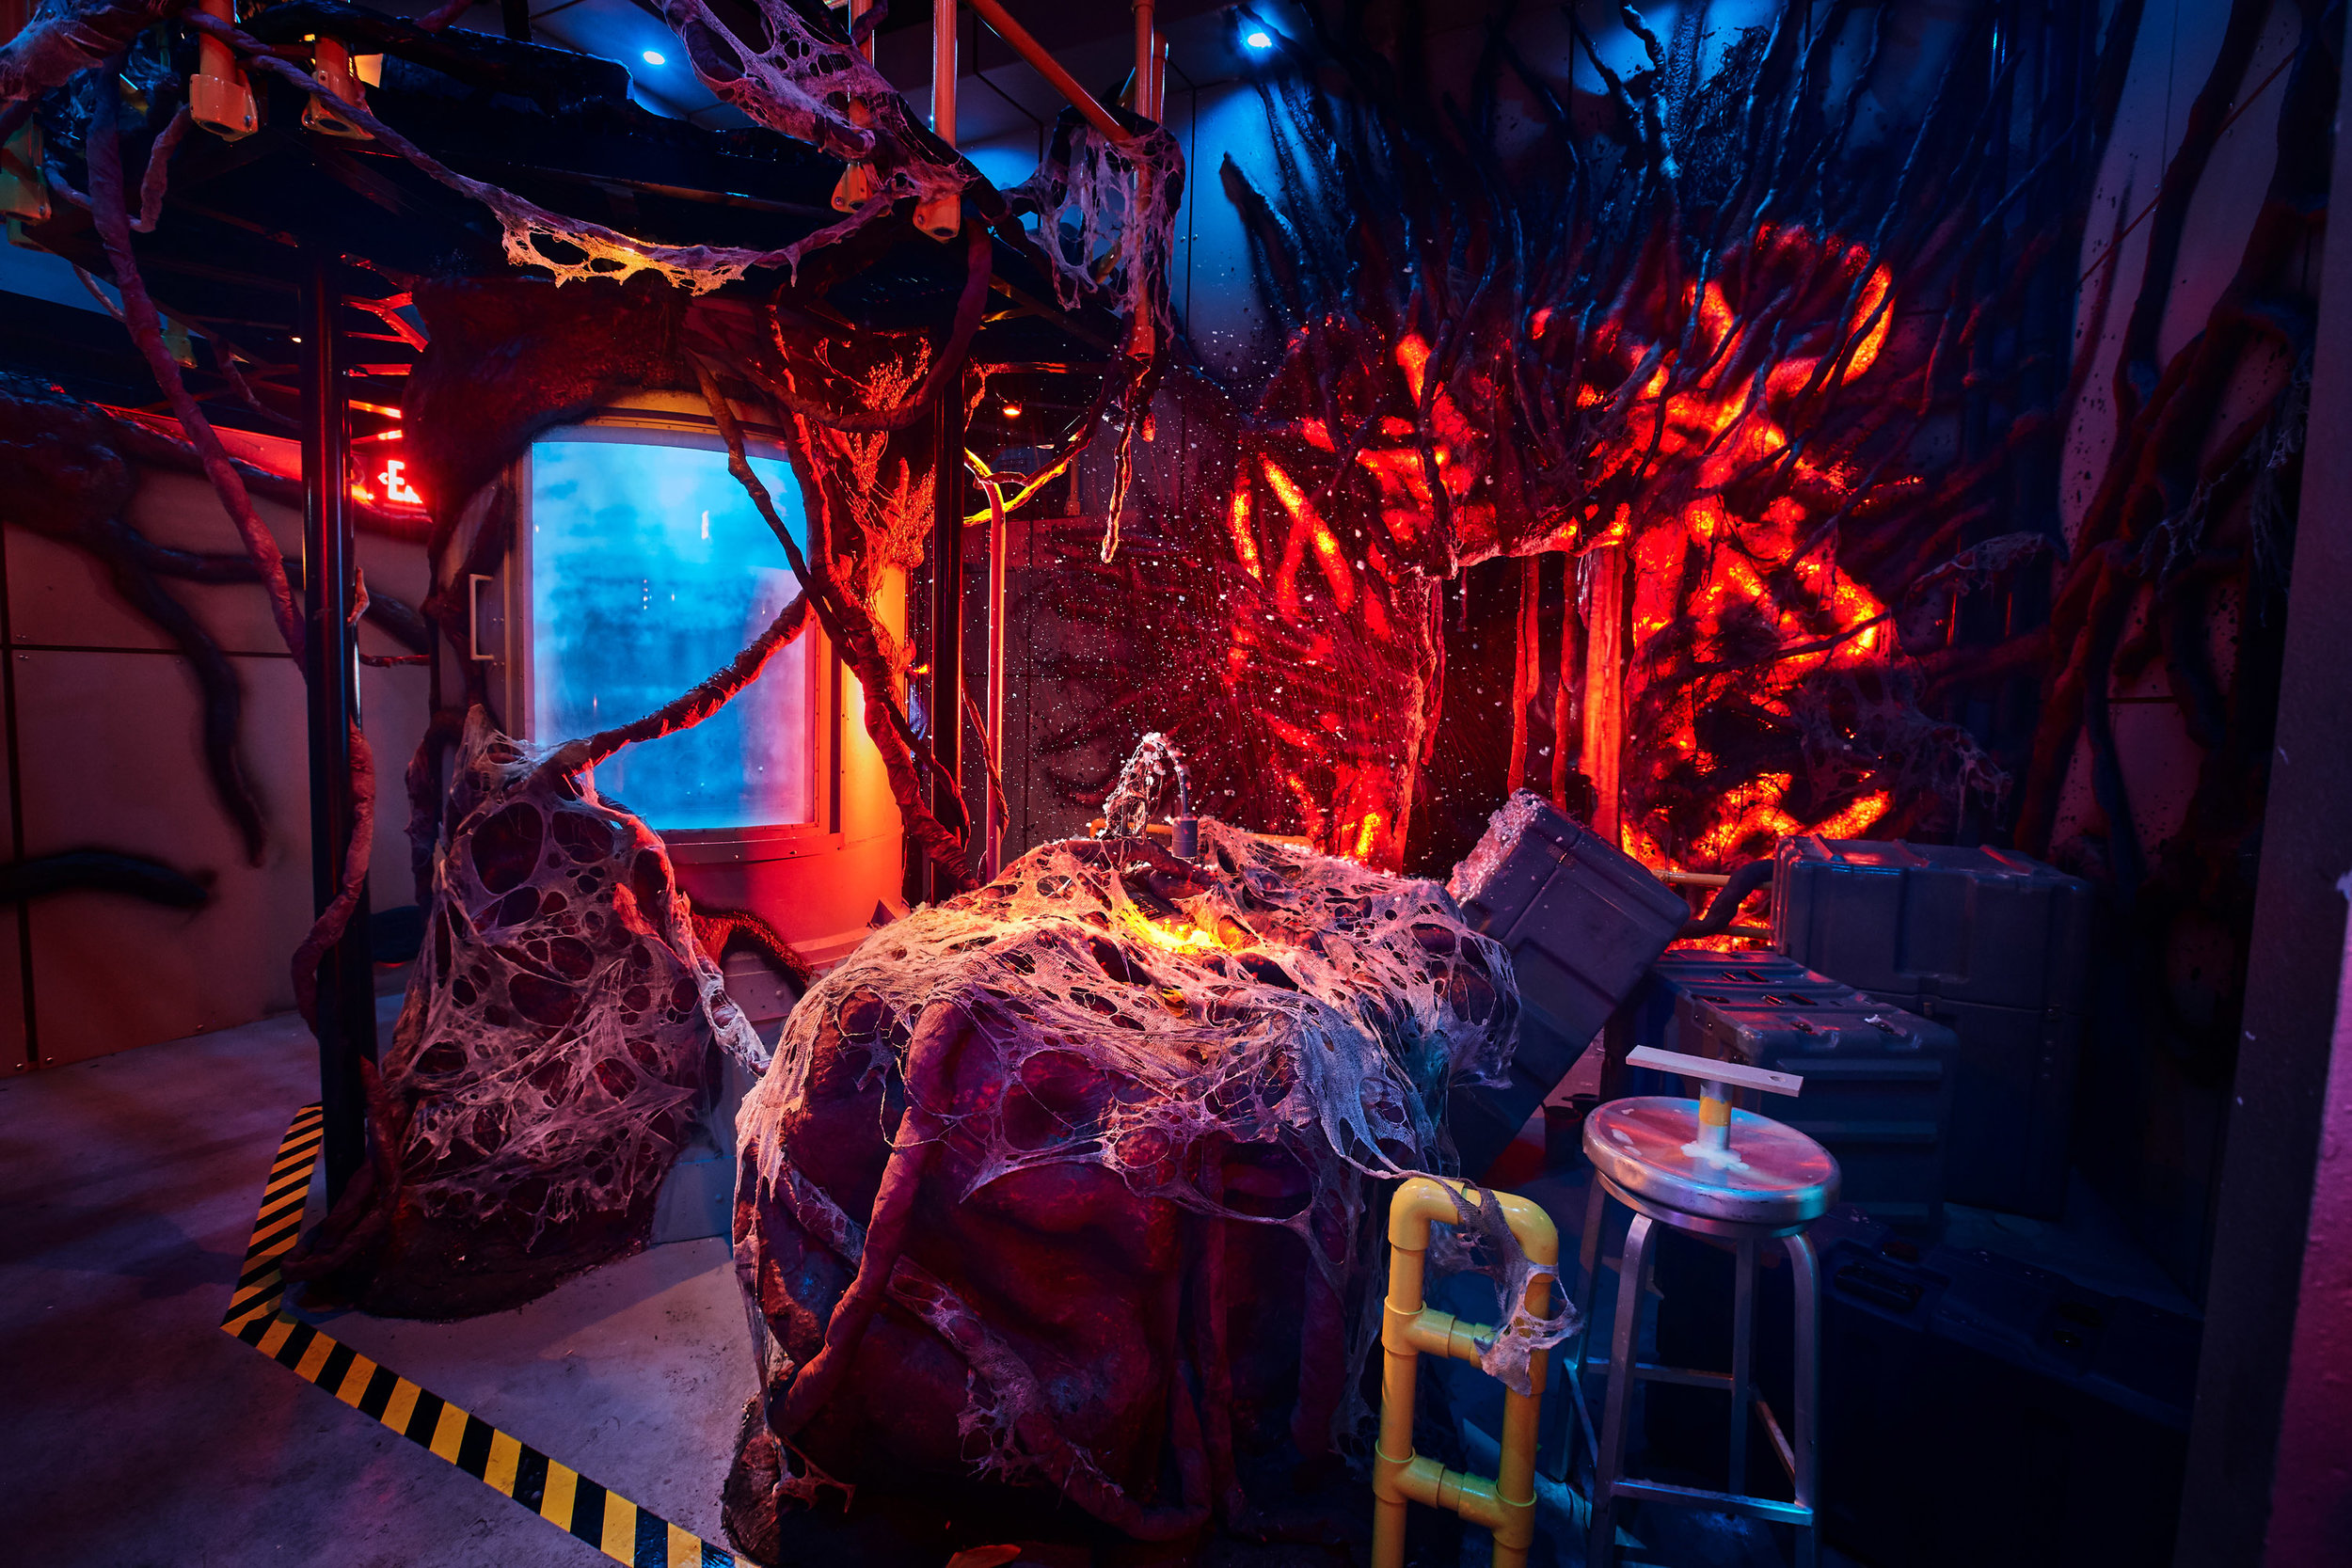 3_First Look Inside Stranger Things maze at HHN 2018.jpg